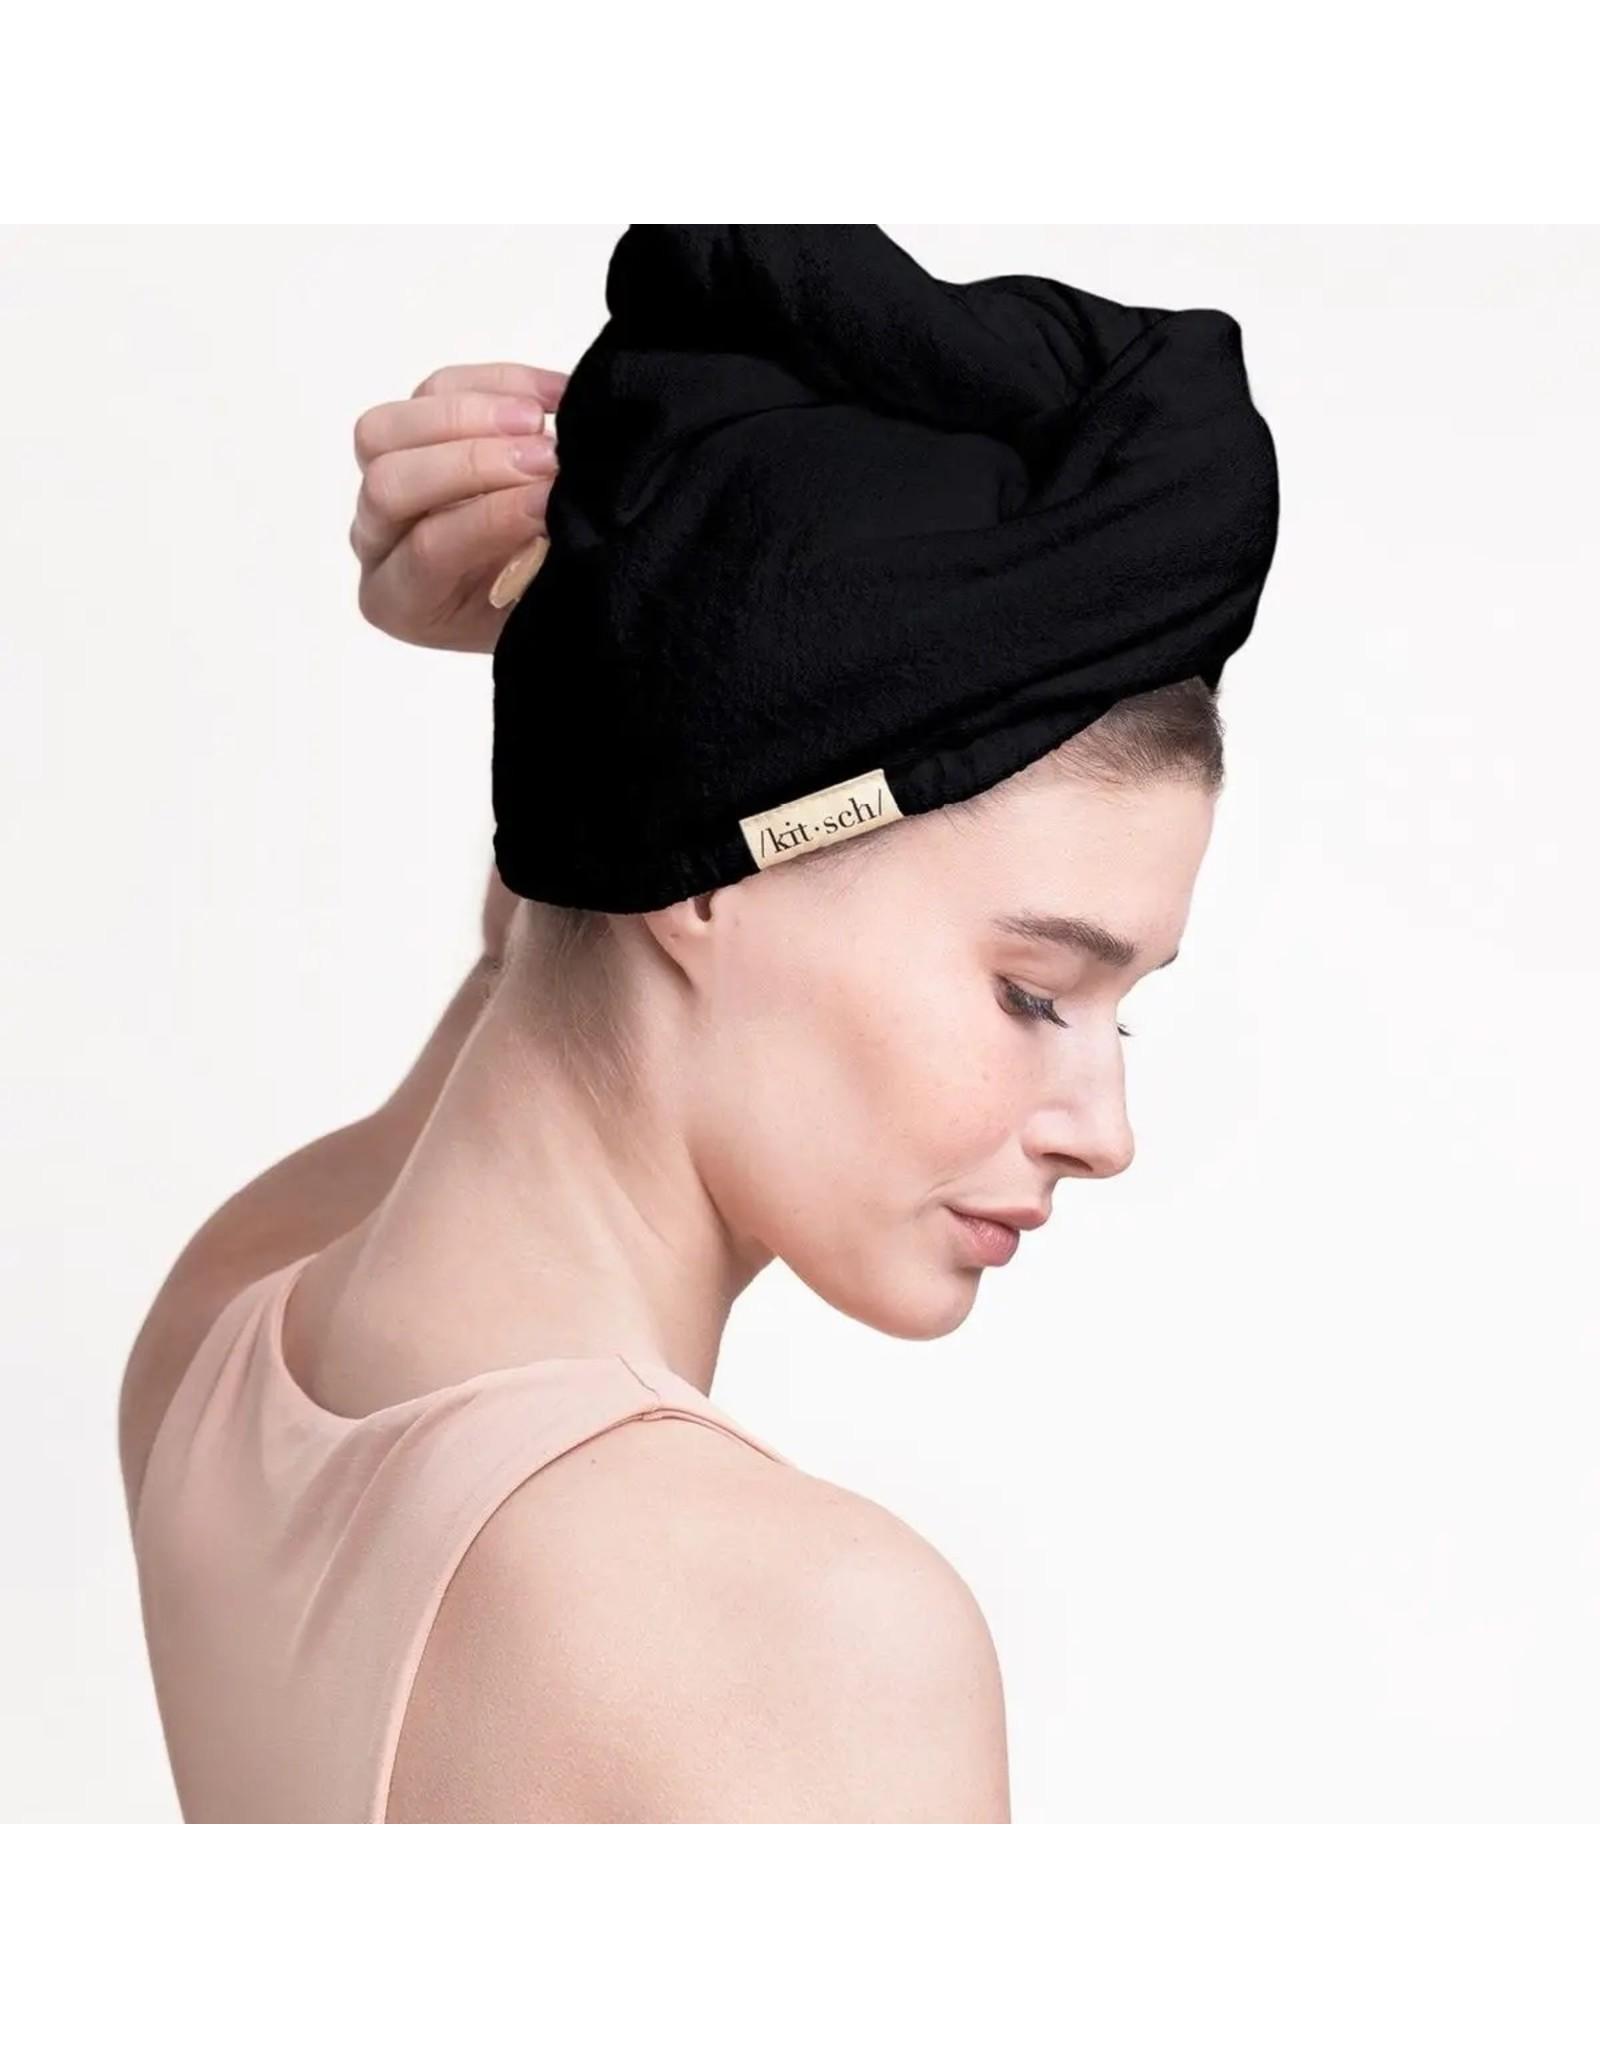 Kitsch Eco-Friendly Hair Towel- Black